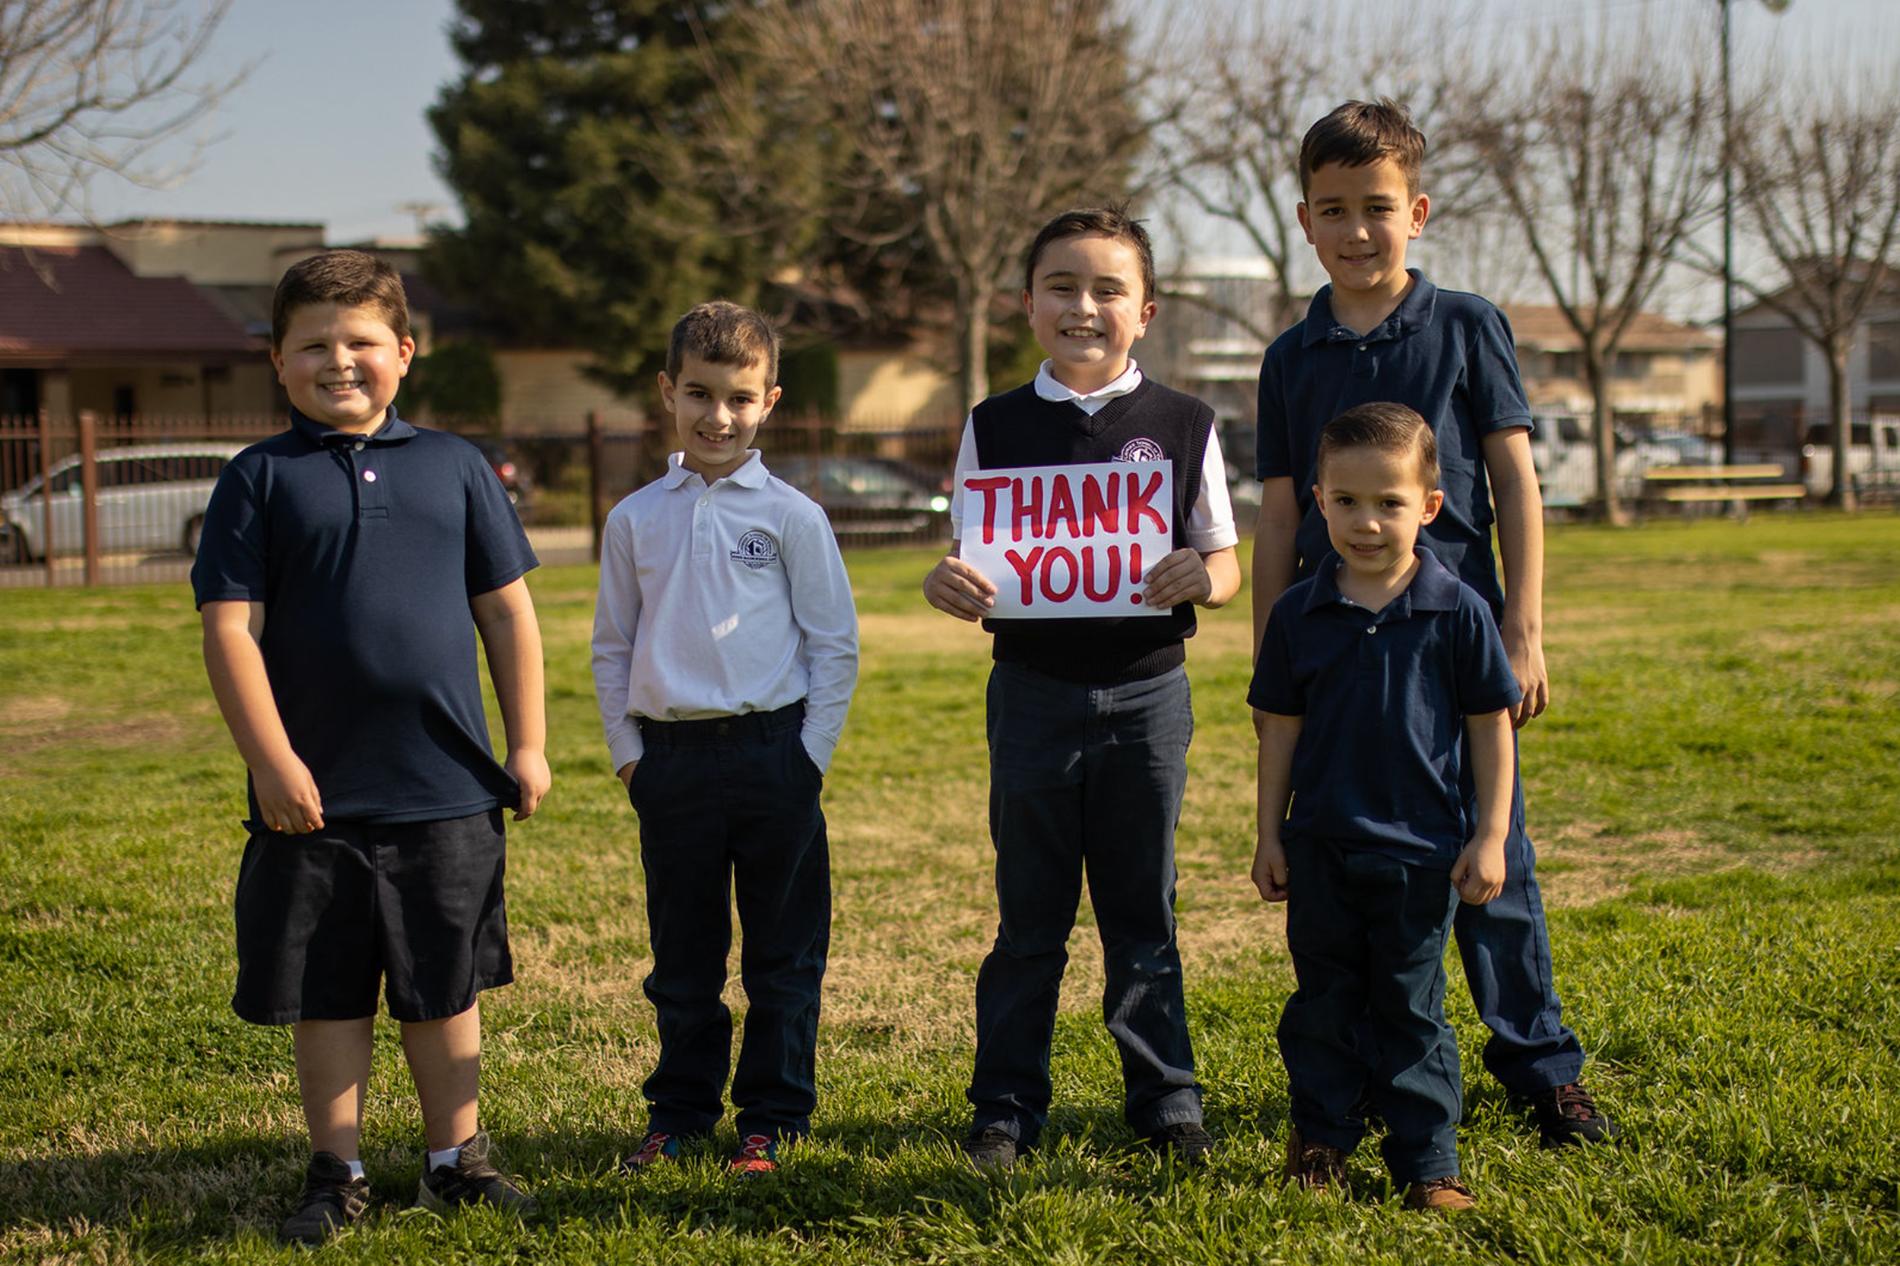 Boys say Thank You